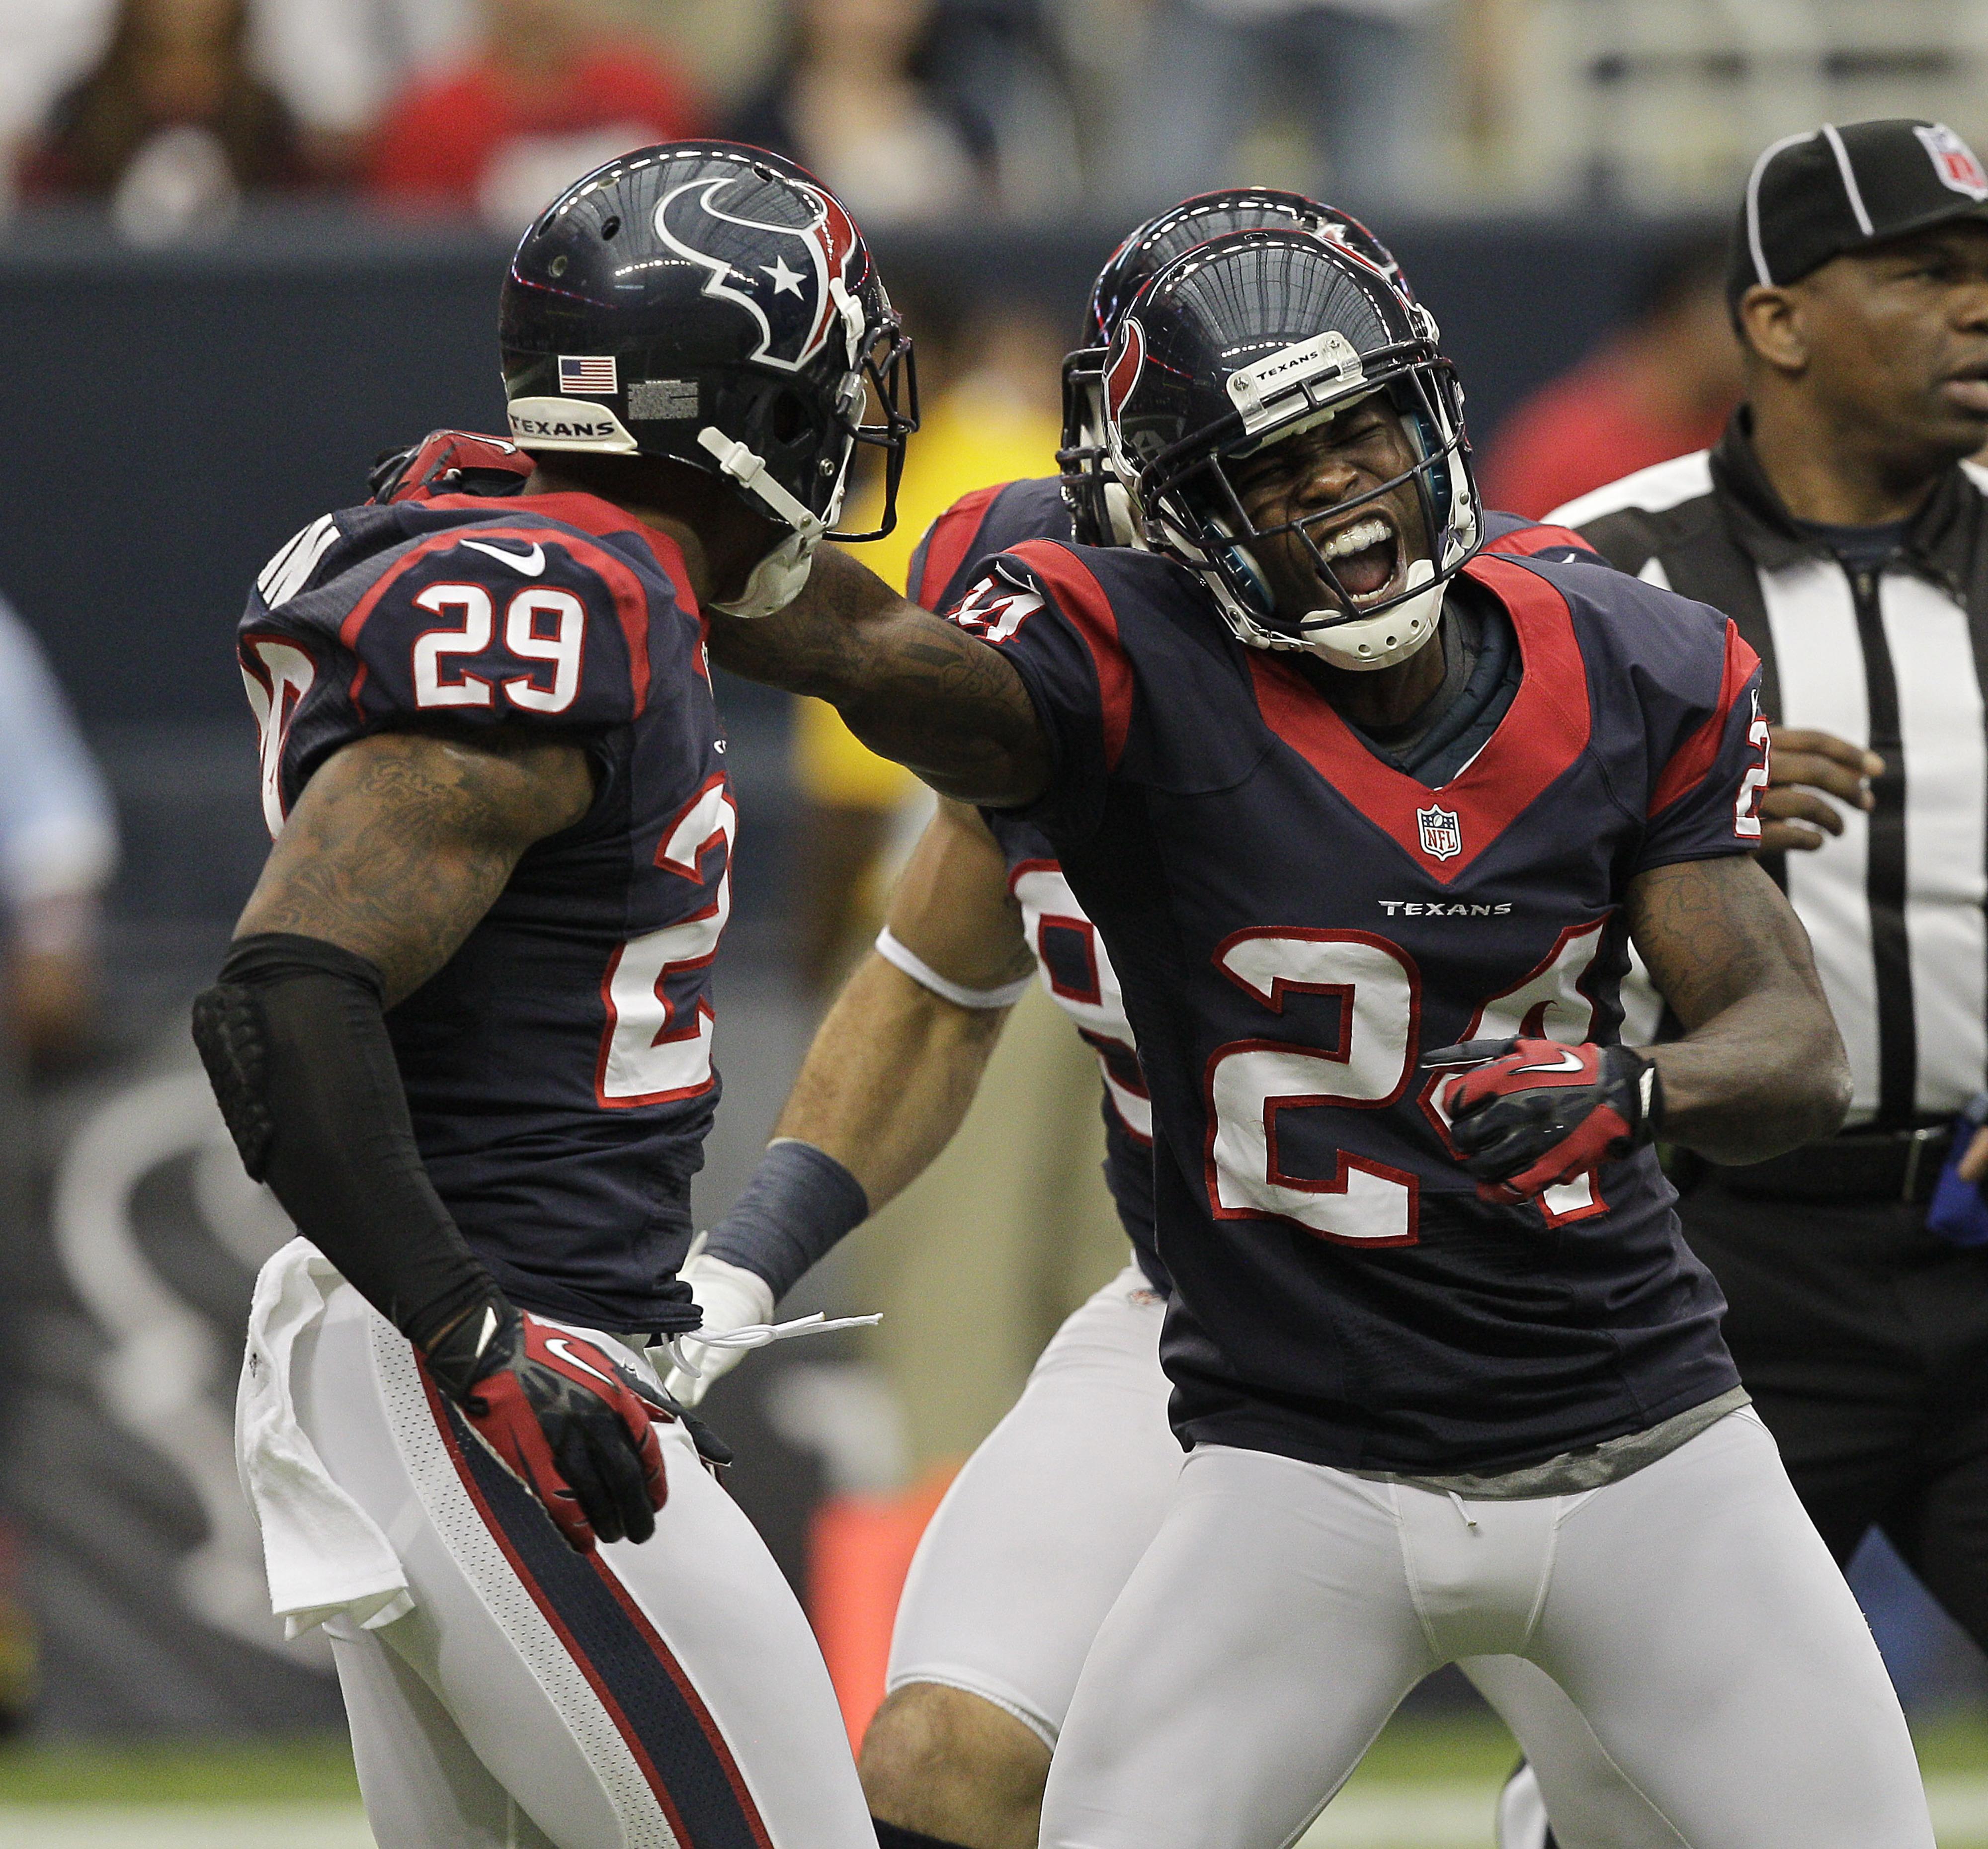 Nfl1000 Rookie Review From Week 9: Week 4 2012: Texans Vs. Titans